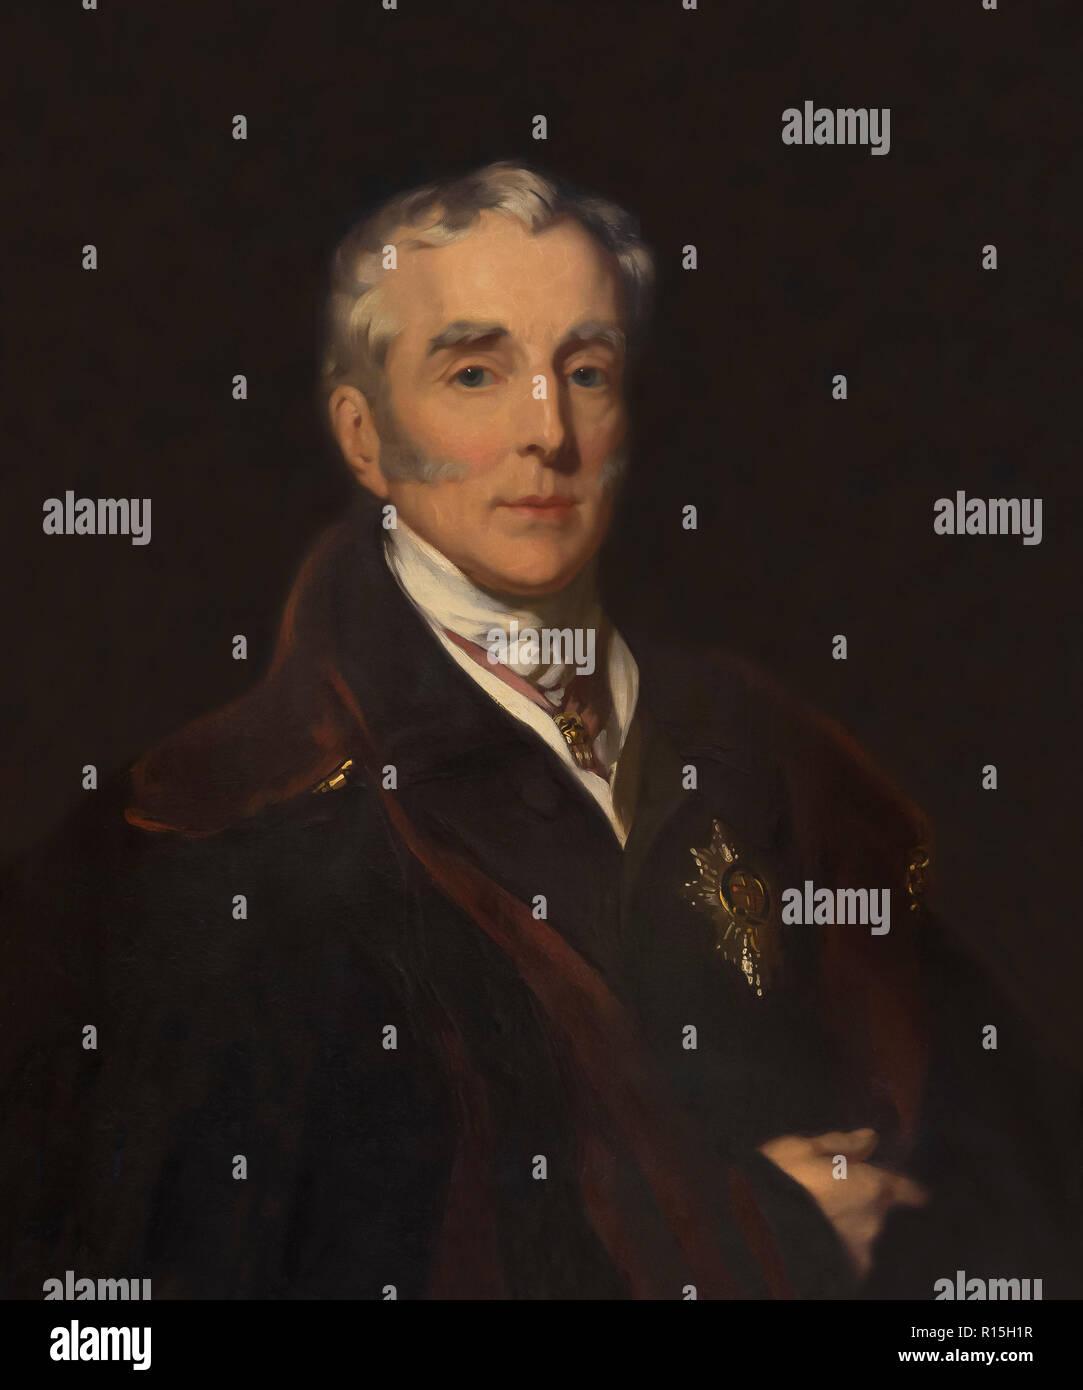 Duke of Wellington, Portrait, John Lucas, 1839, Lady Lever Art Gallery, Port Sunlight, Liverpool, England, UK, Europe - Stock Image